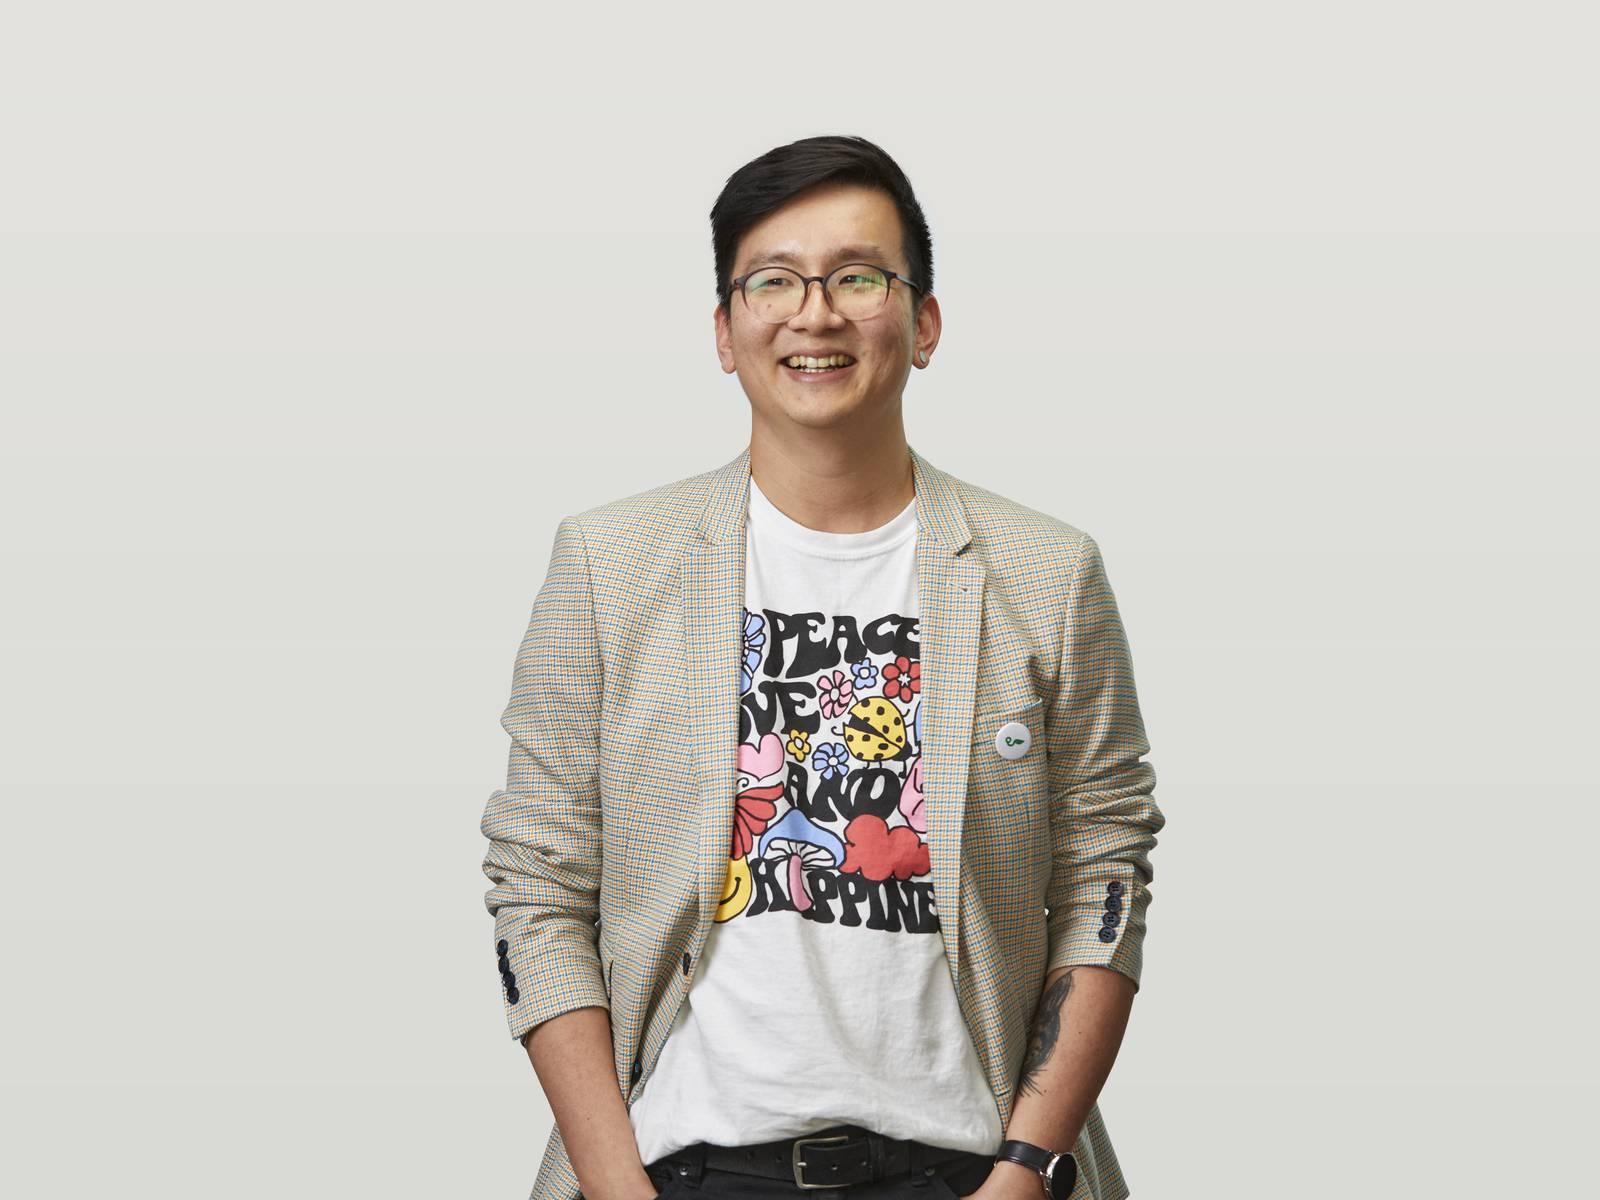 A profile image of Ern Wong